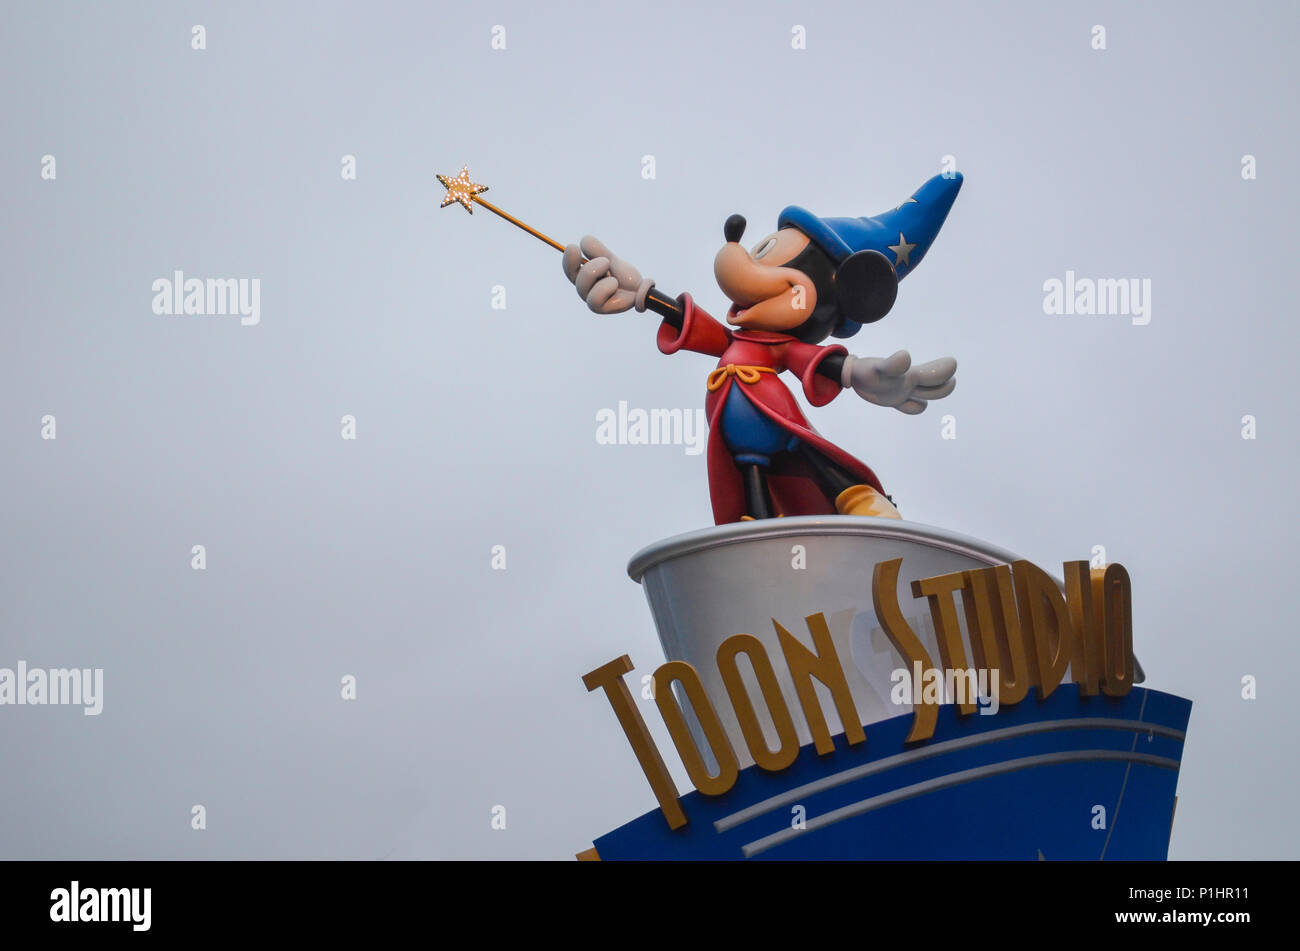 Figurine Remy Place of Toon Studio Disneyland Paris Square of Remy